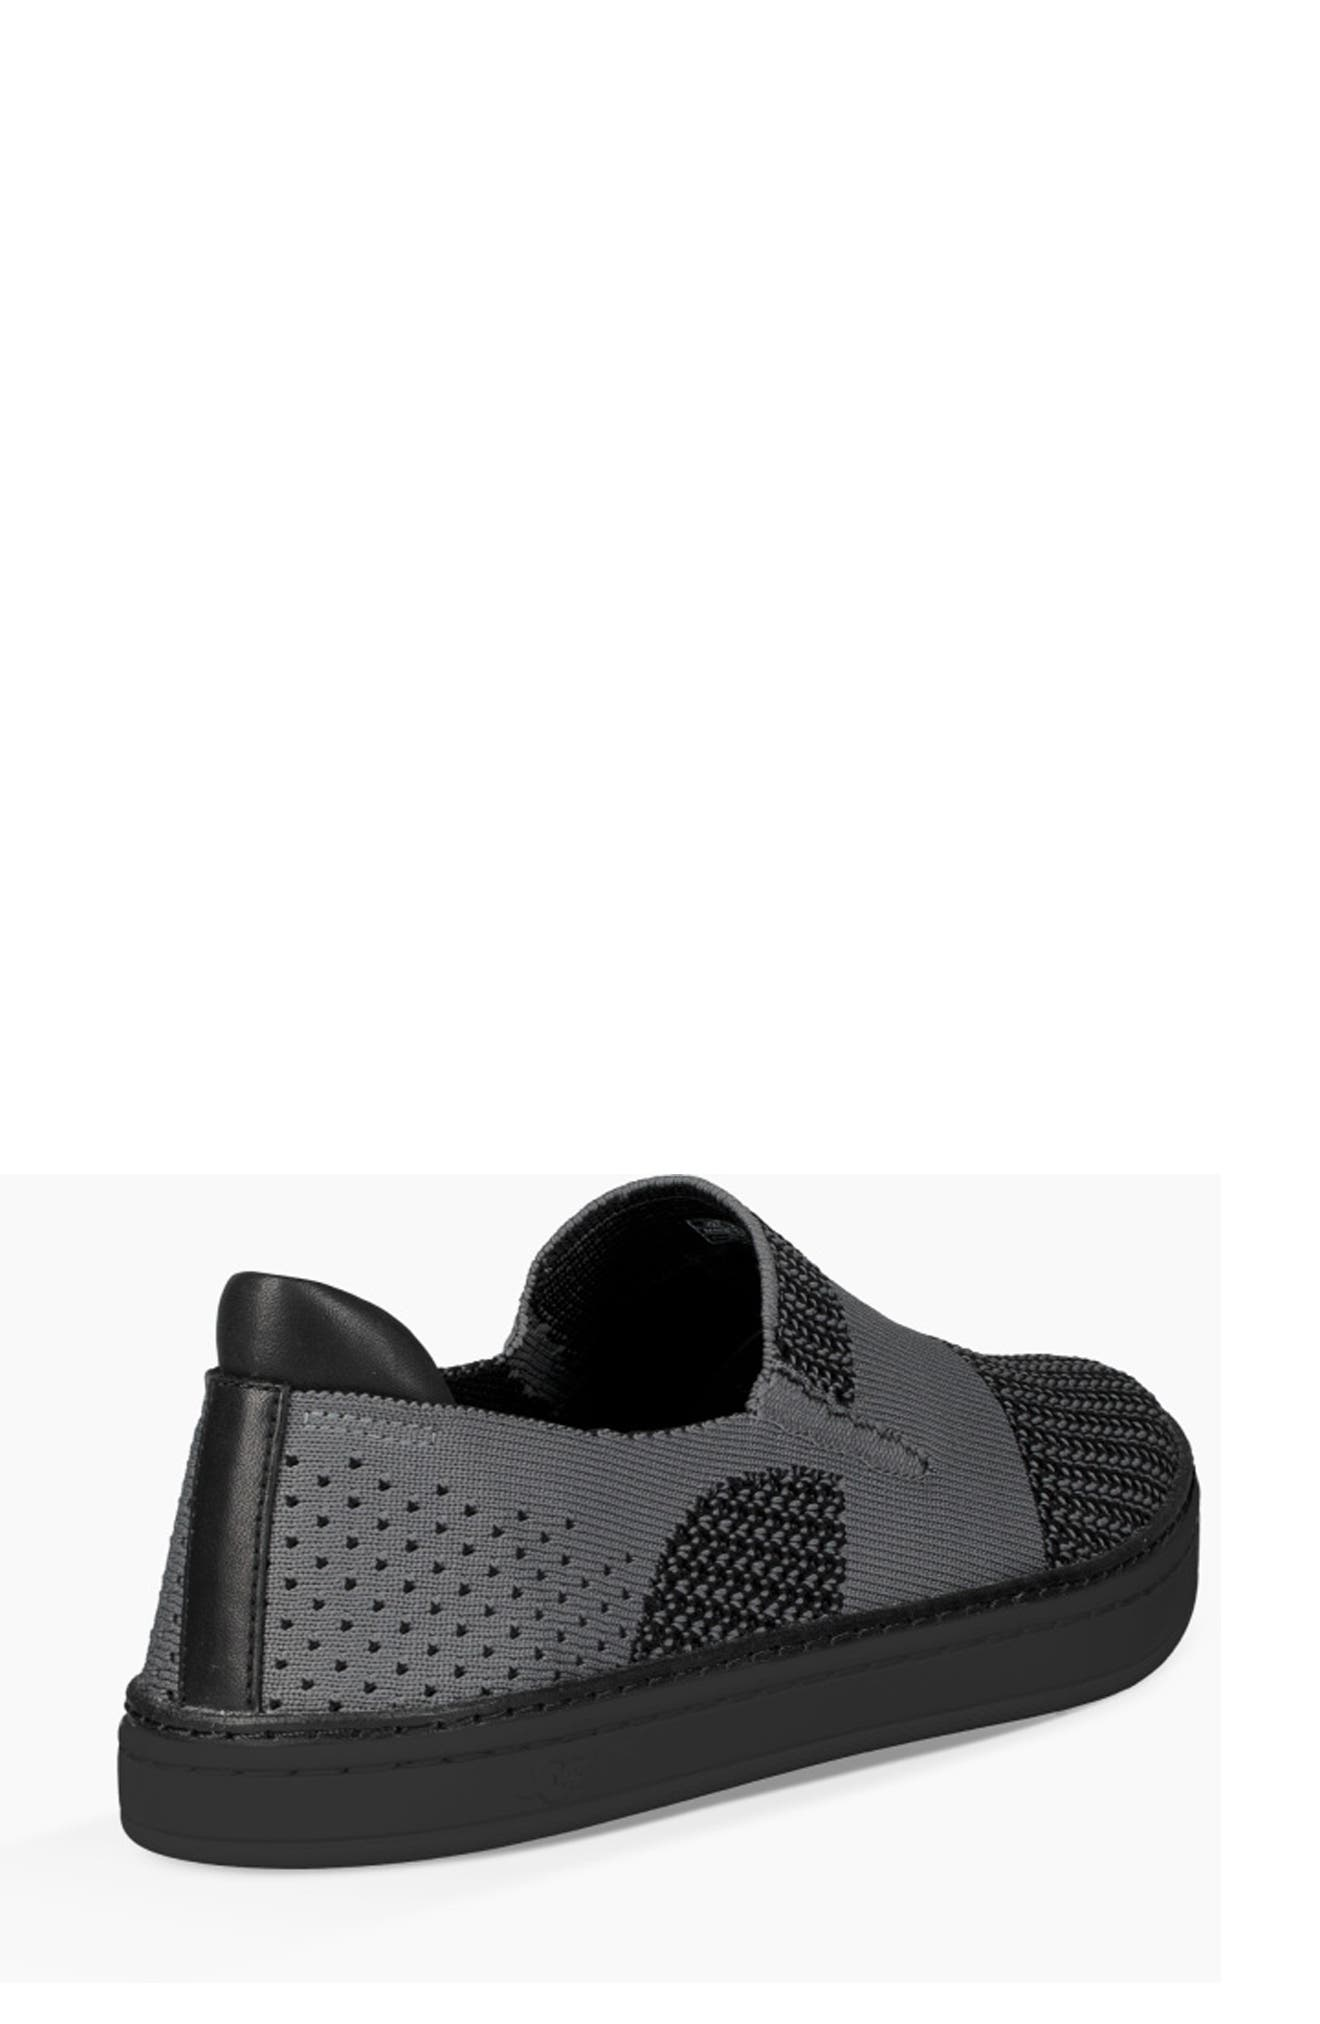 Sammy Sneaker,                             Alternate thumbnail 2, color,                             BLACK/ BLACK FABRIC